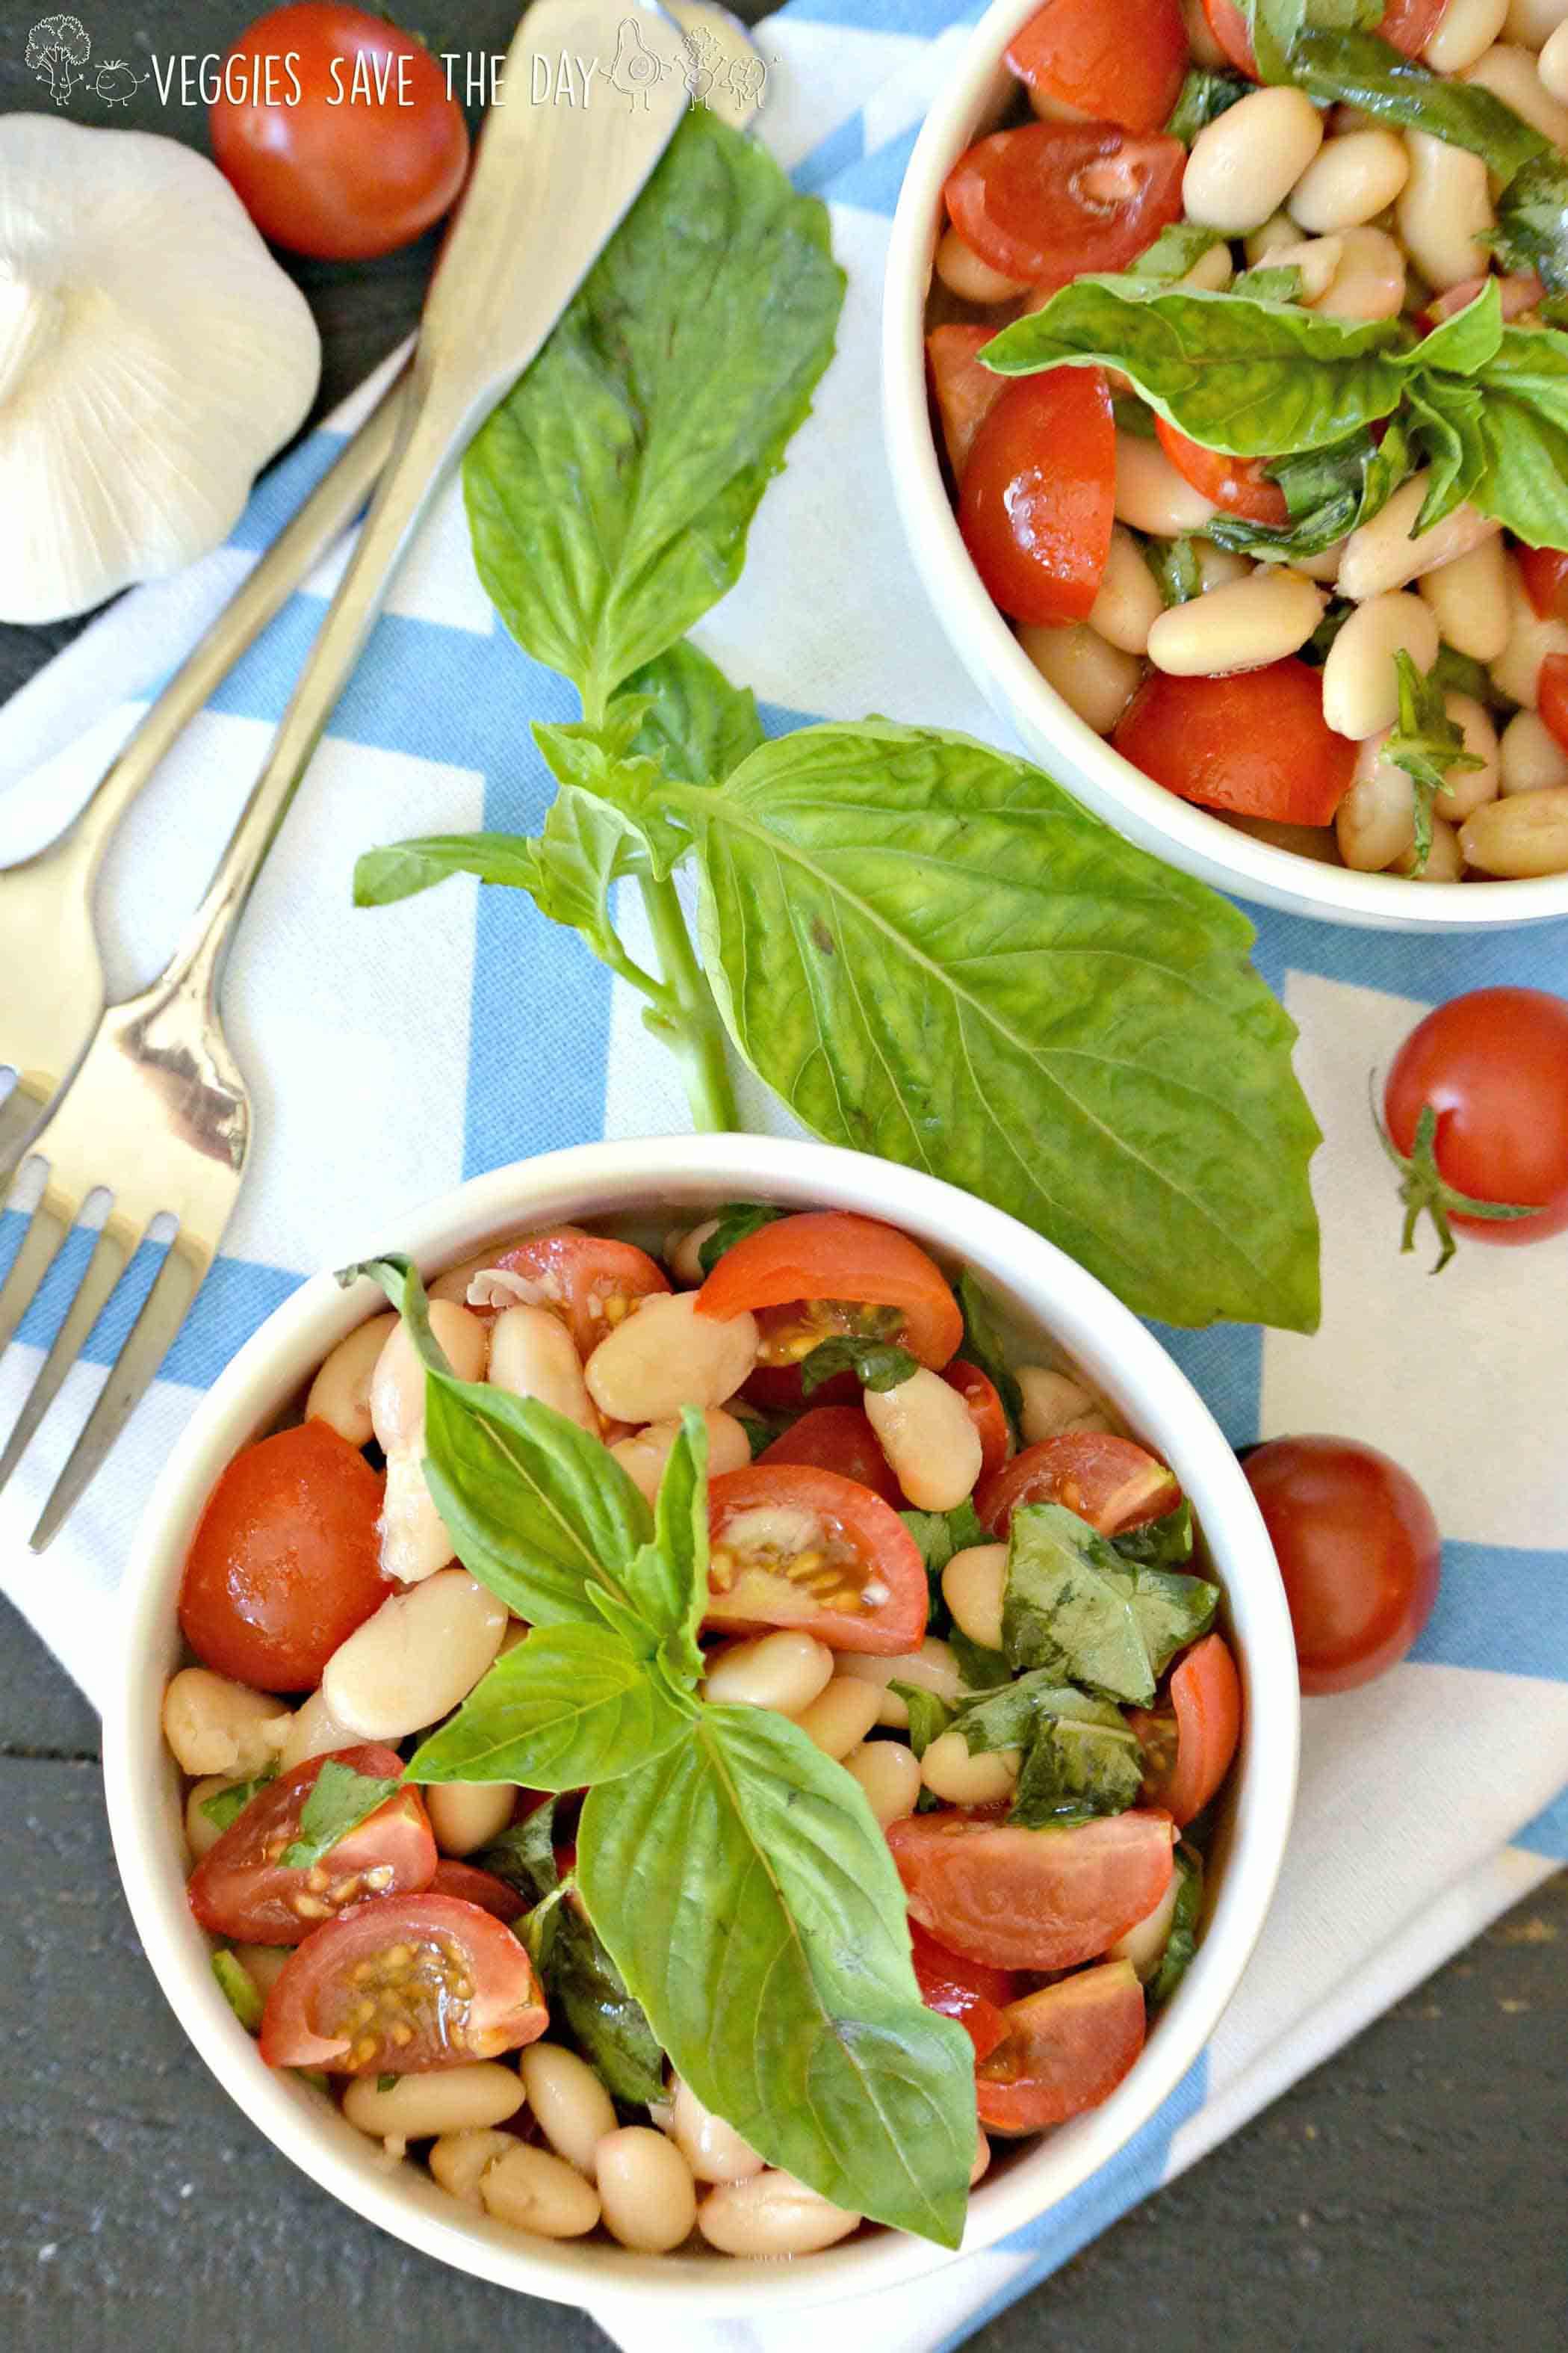 Vegan White Bean Cherry Tomato Basil Salad, by Veggies Save the Day